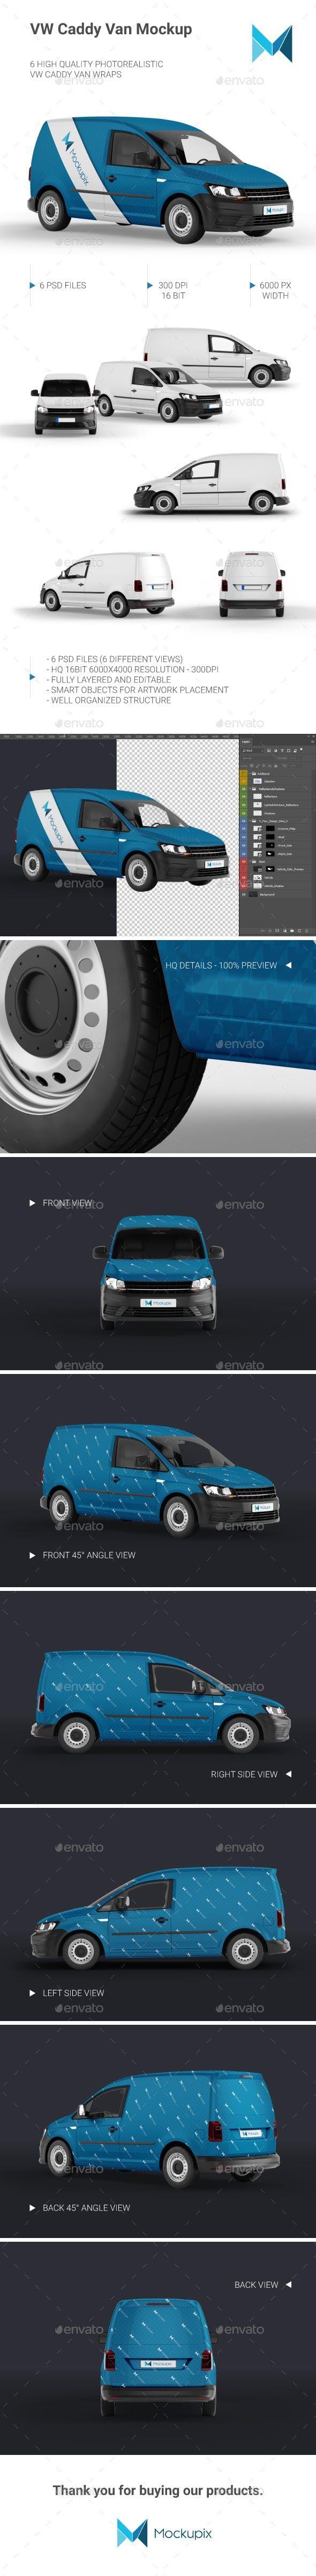 Vw Caddy Van Mockup Vehicle Wraps Print Download Link